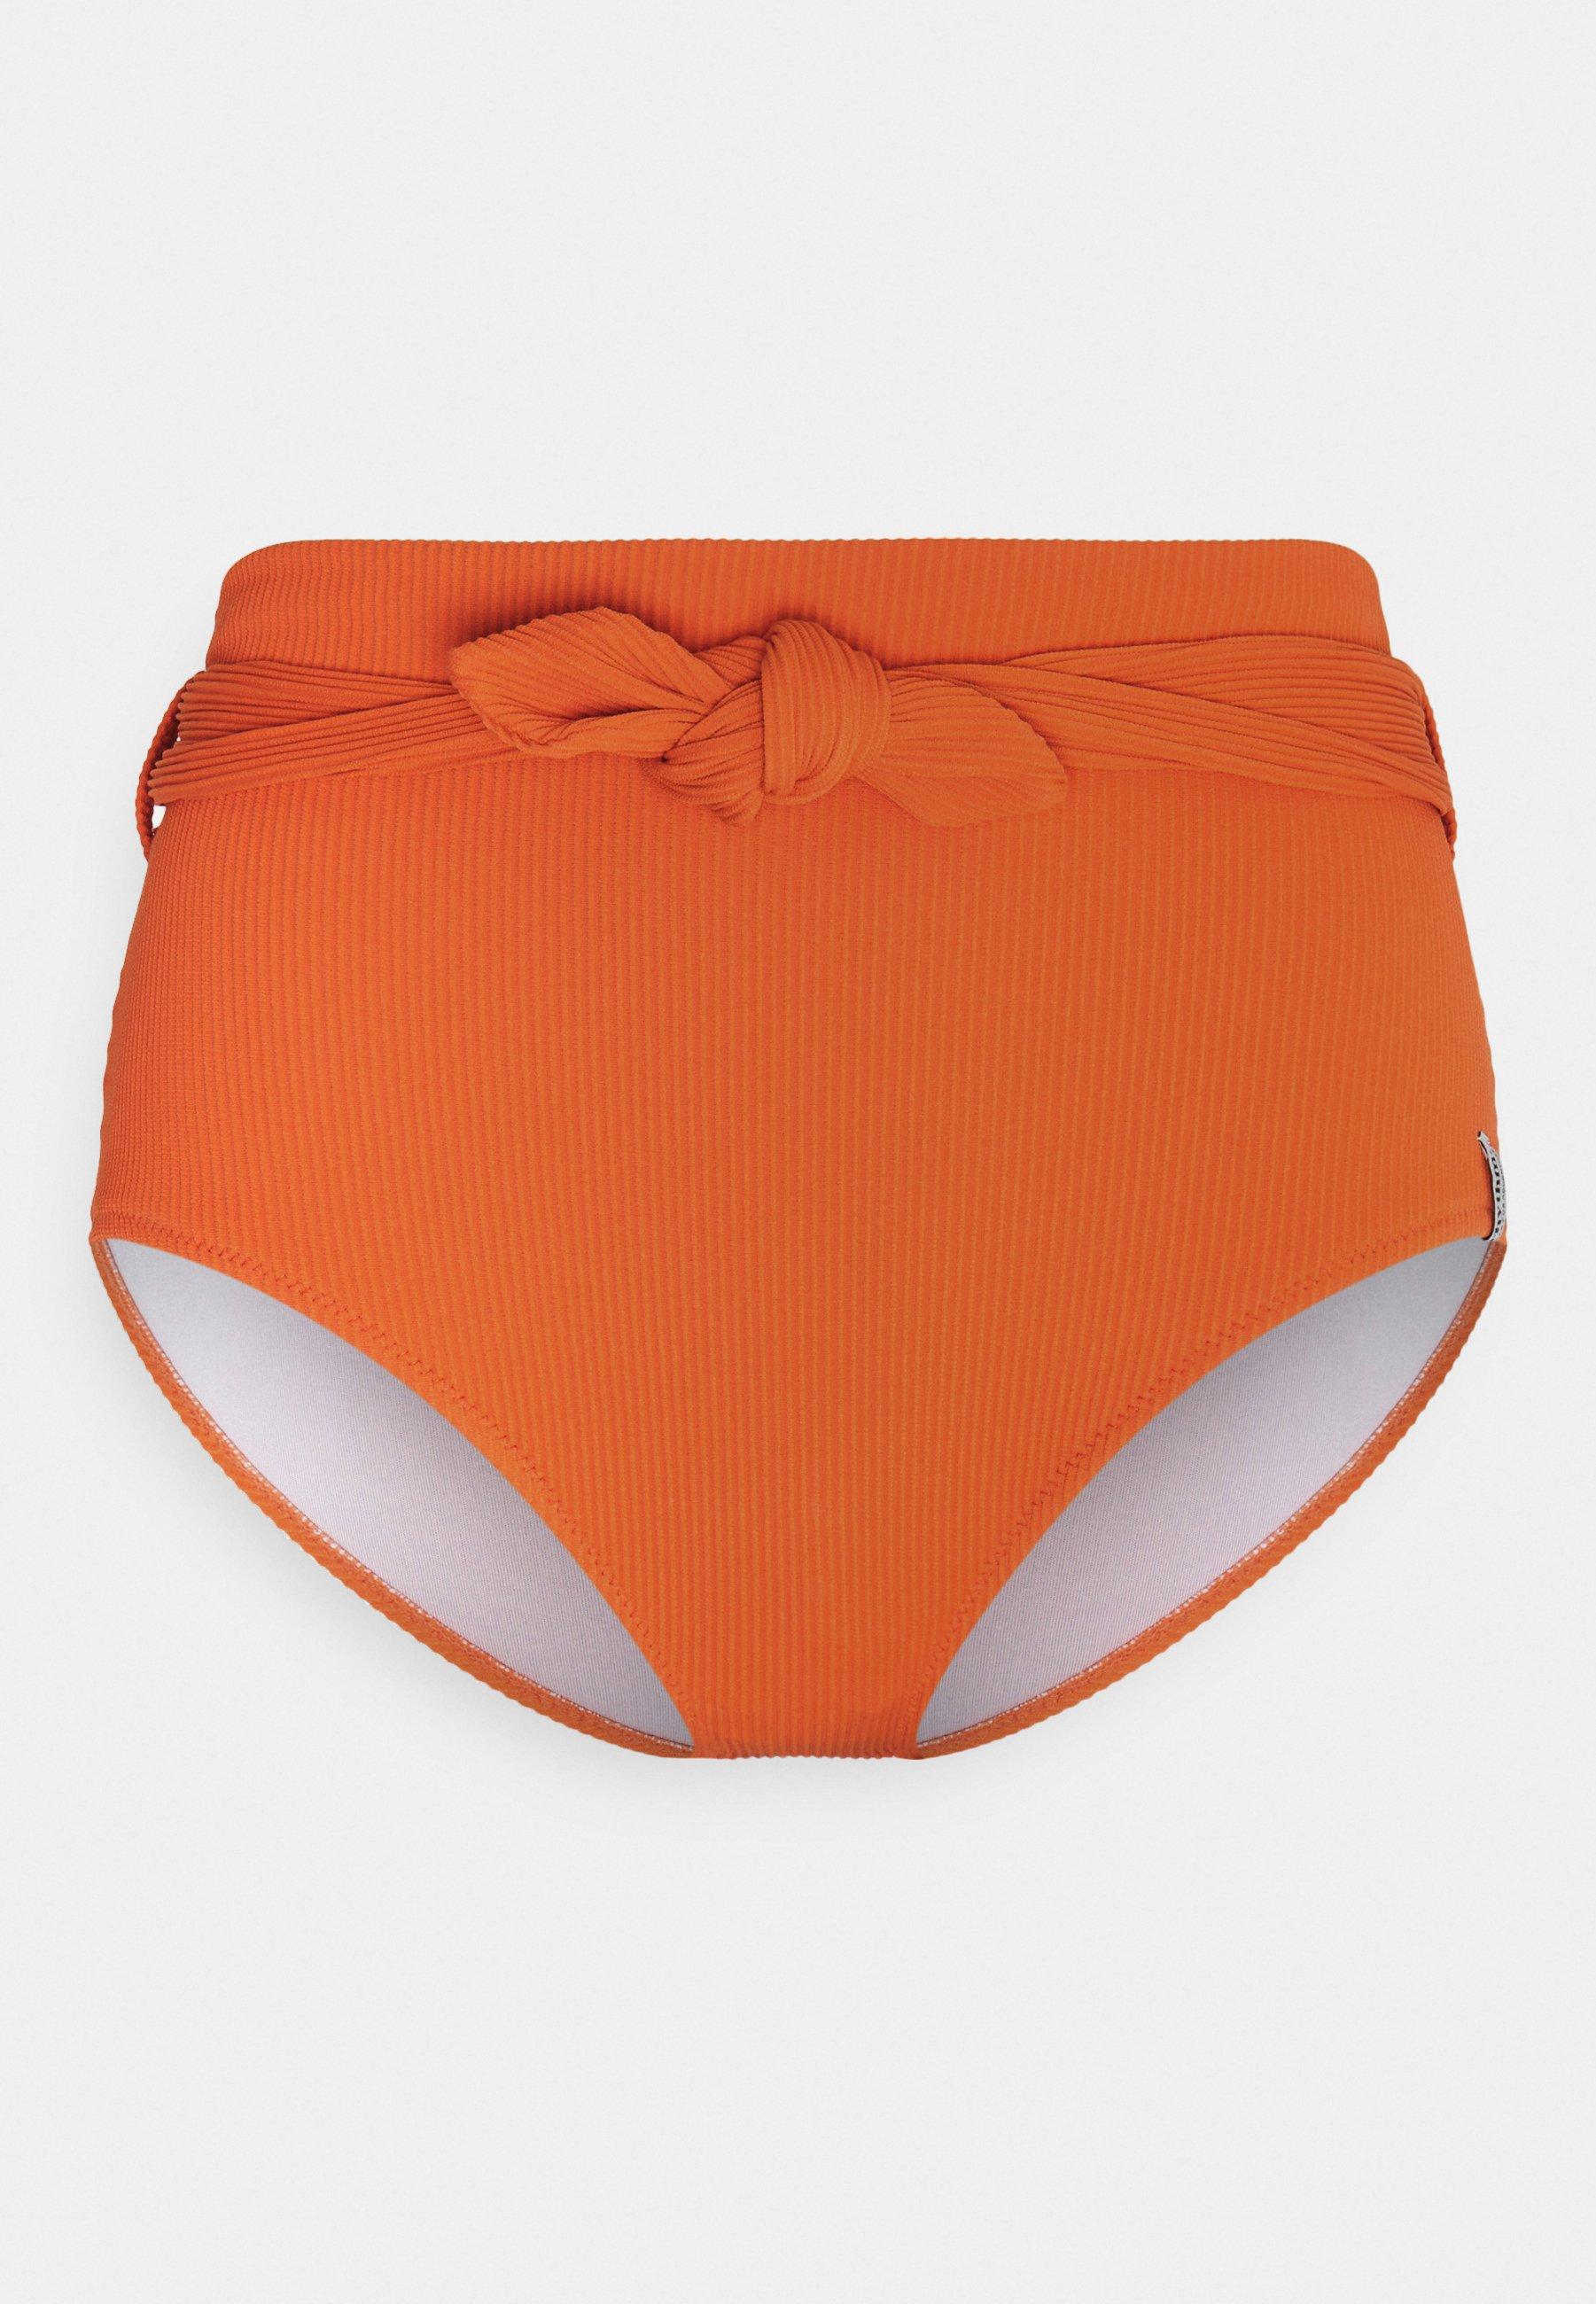 Femme PALM SPRINGS HIGH WAISTED BOTTOM - Bas de bikini